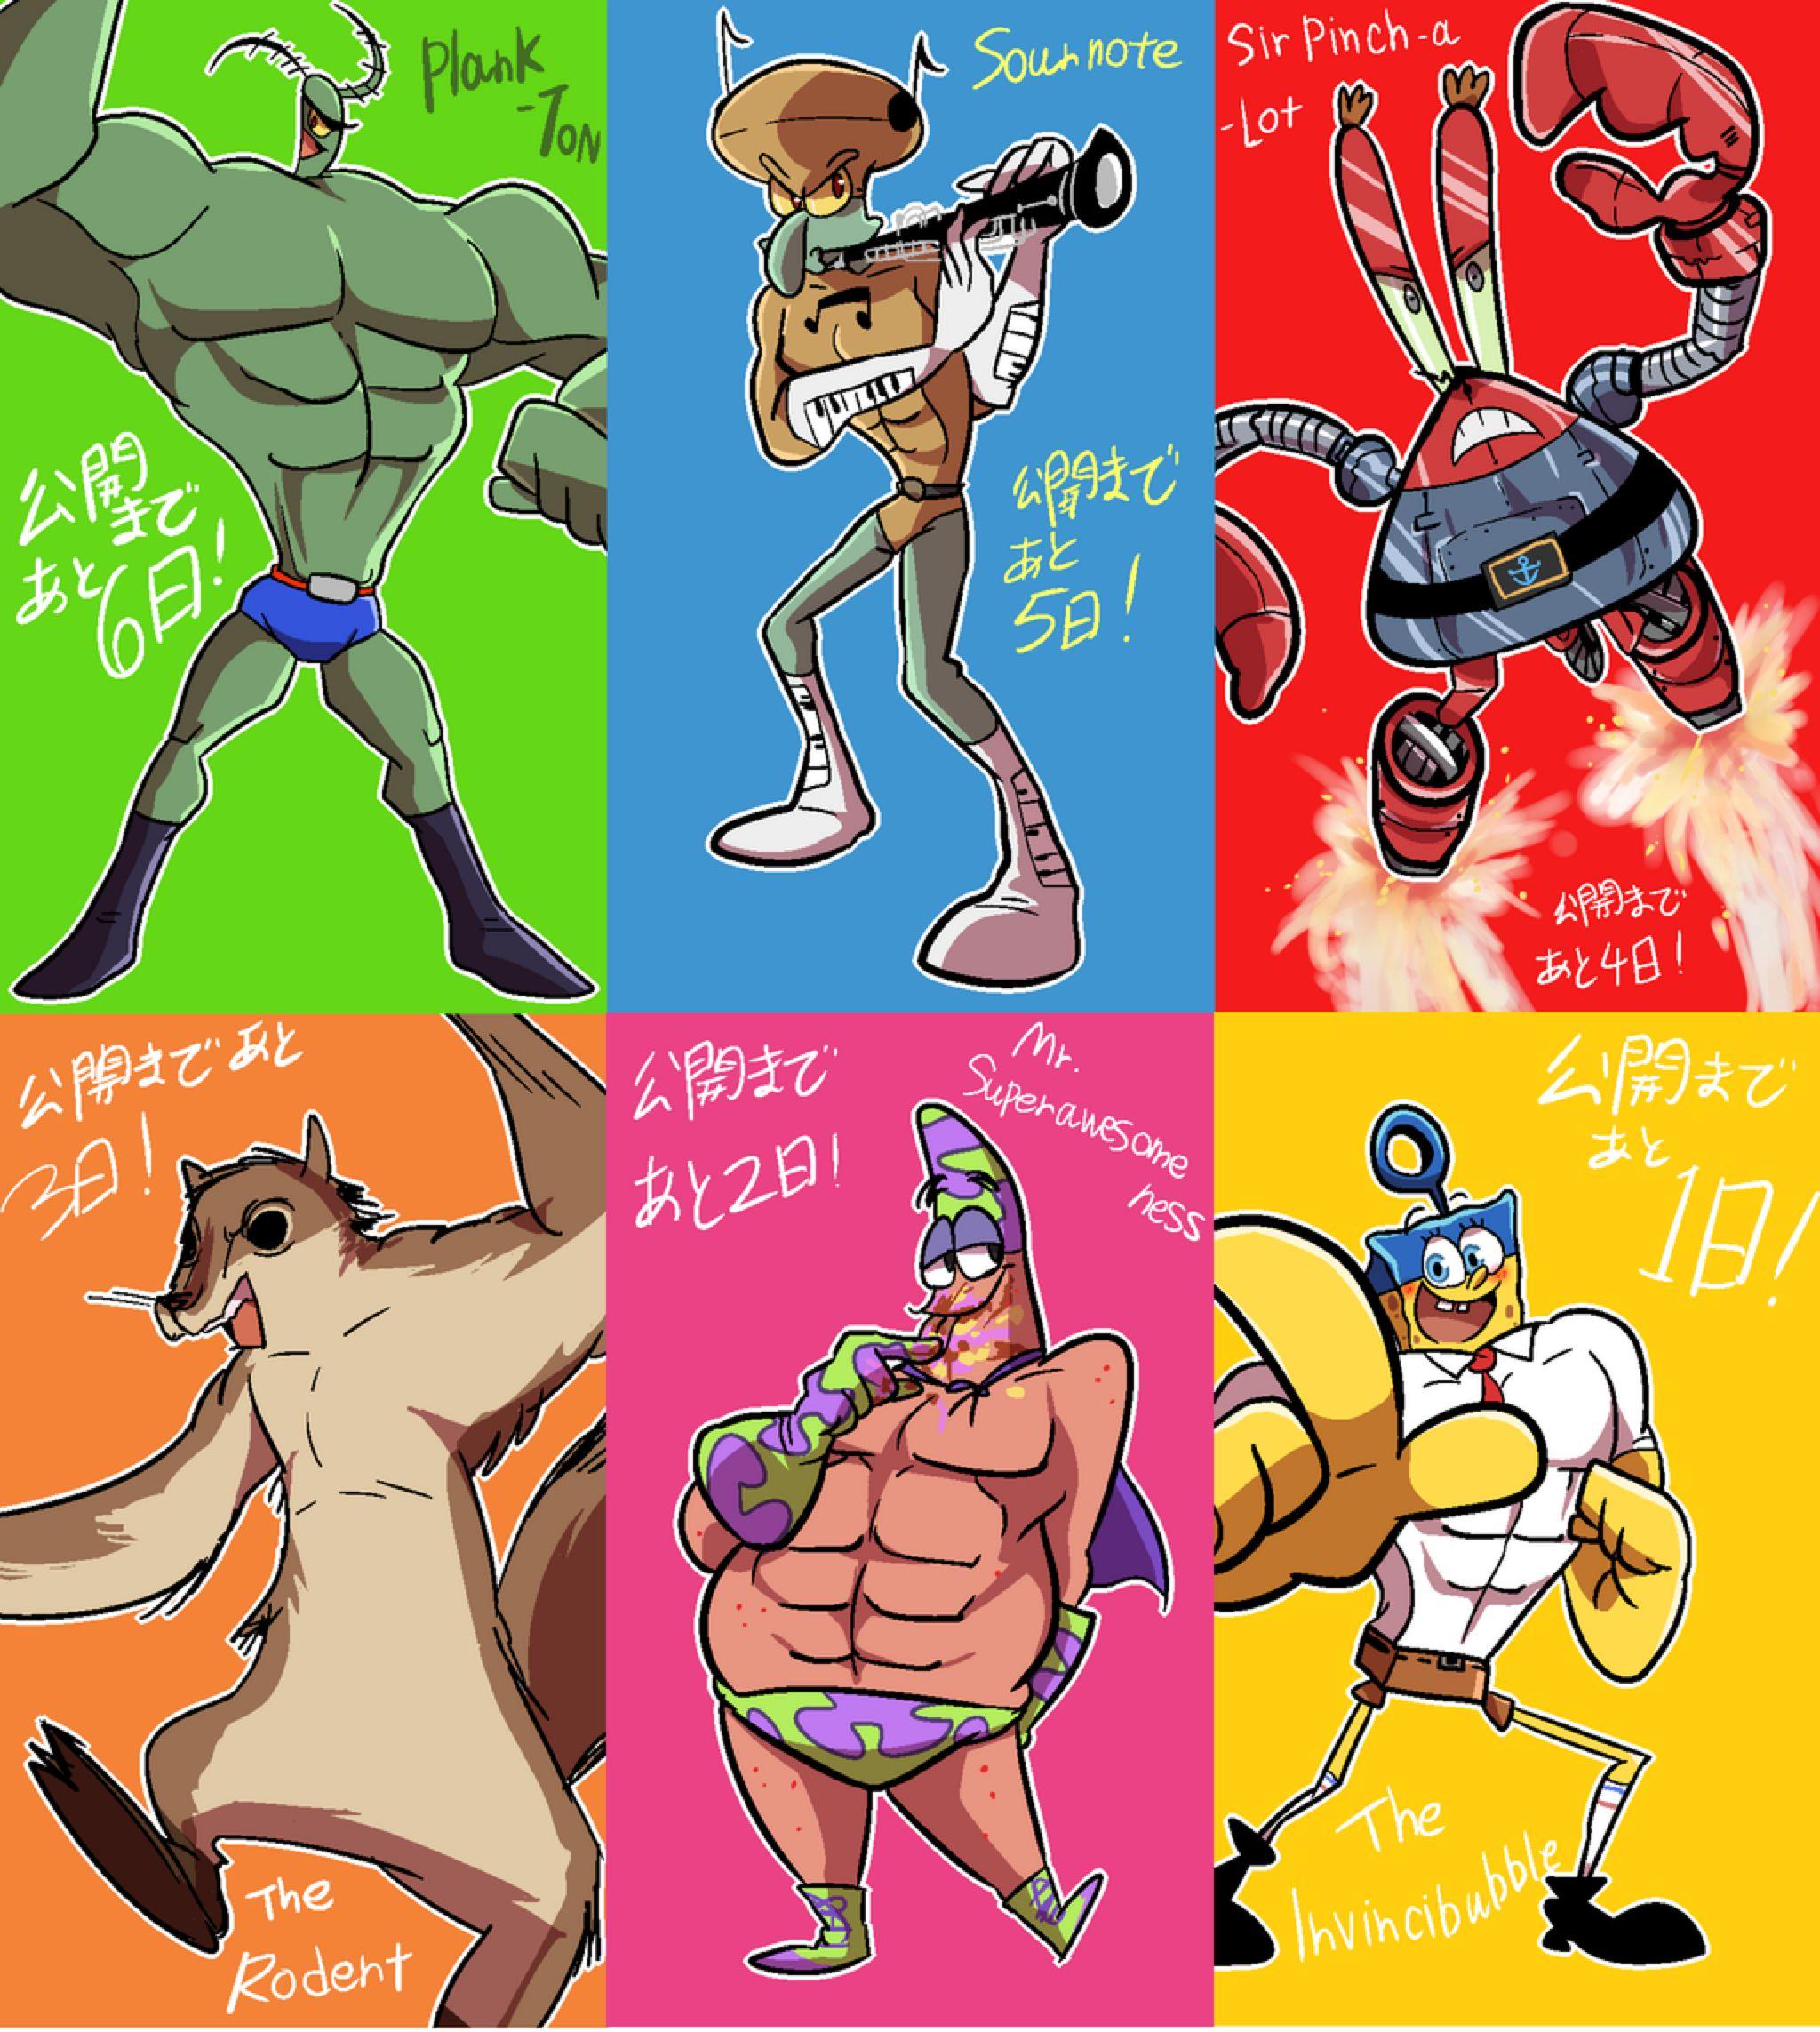 spongebob the heros! by EZstrongs on DeviantArt